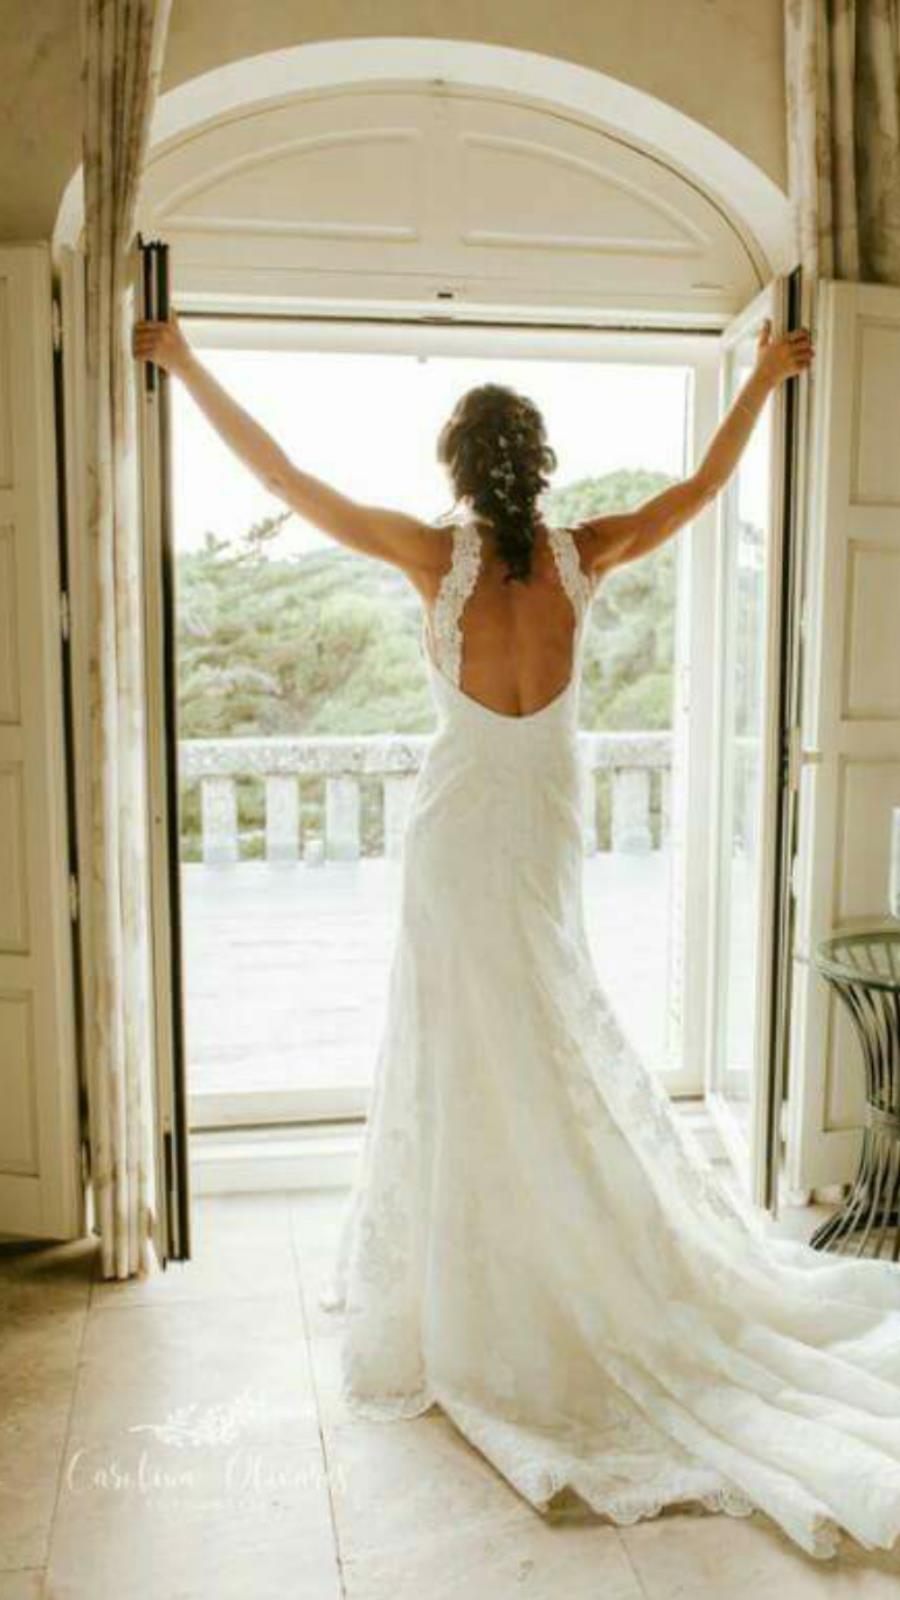 Donde venden vestidos de novia baratos